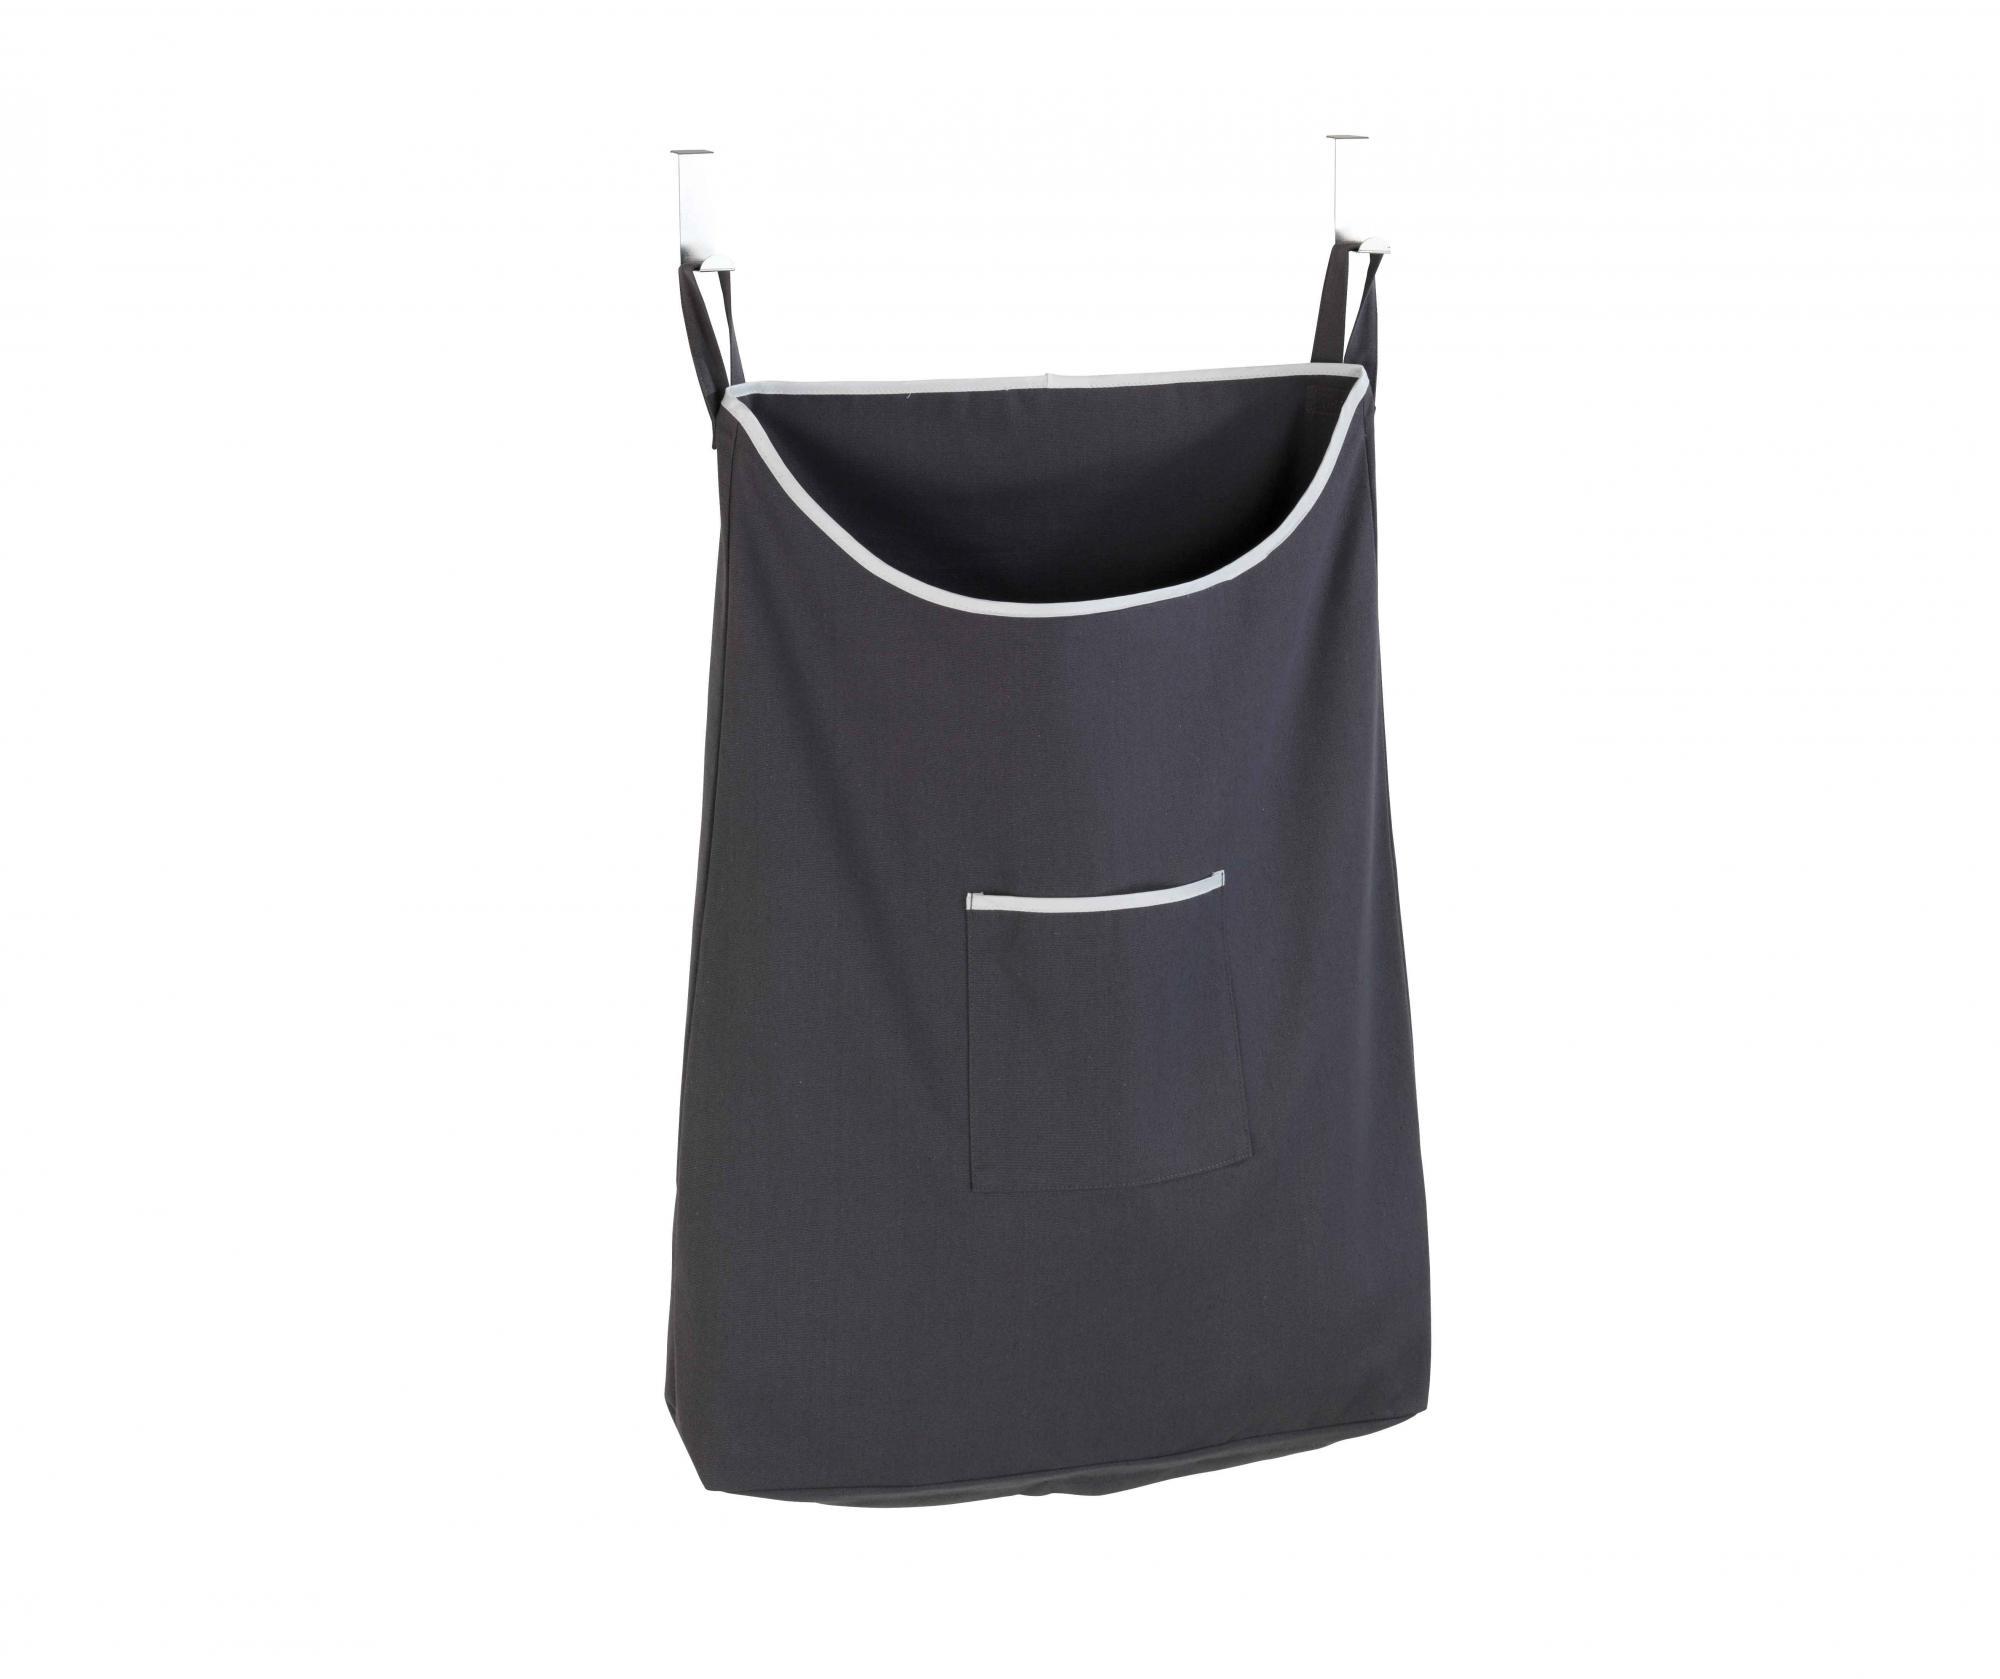 Set 2 cuiere si geanta pentru rufe Canguro Grey 65 L - Wenko, Gri & Argintiu